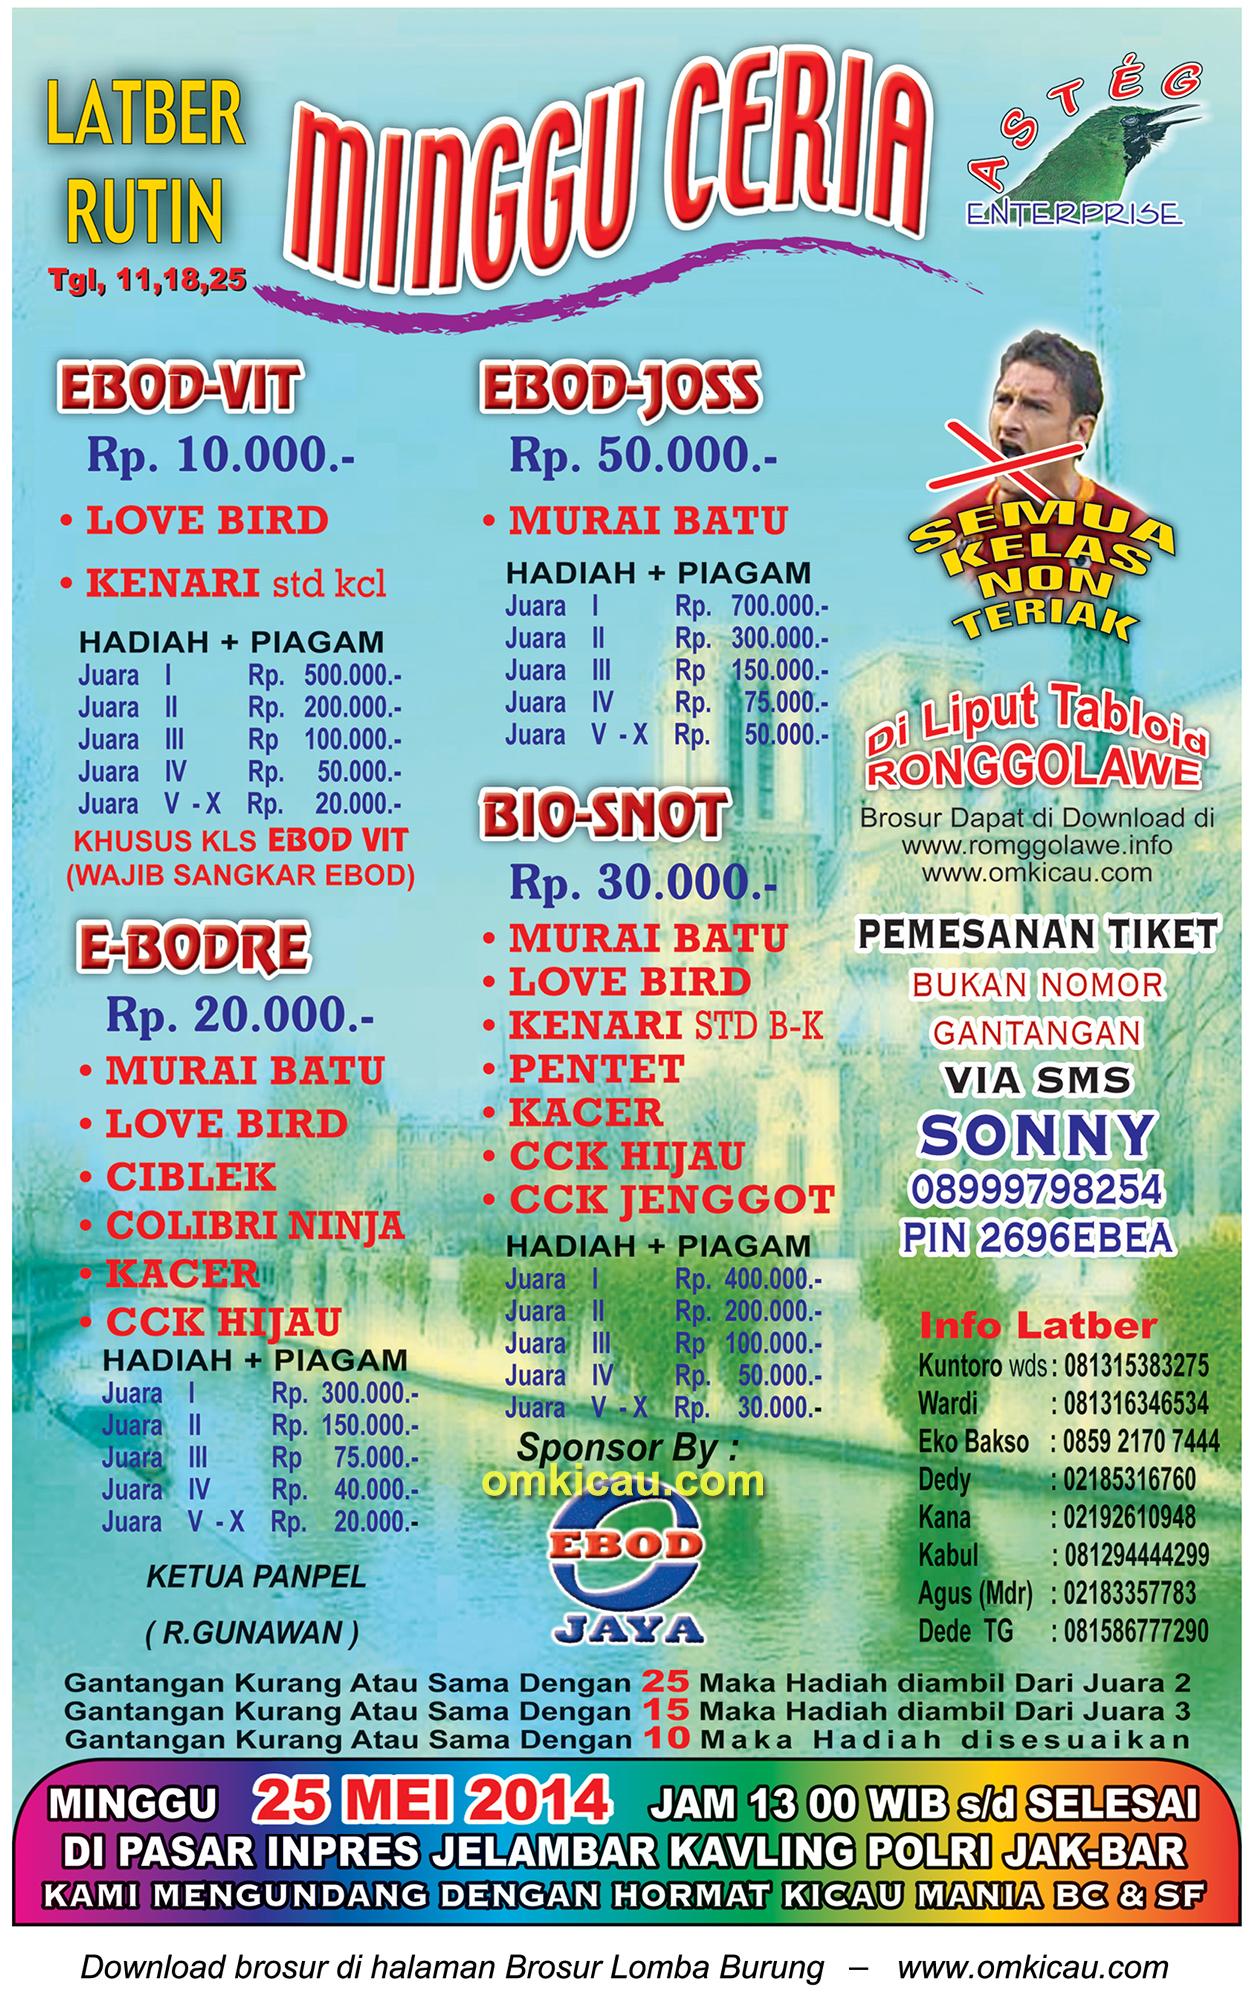 Brosur Lomba Burung Berkicau Asteg Minggu Ceria, Jakarta Barat, 25 Mei 2014